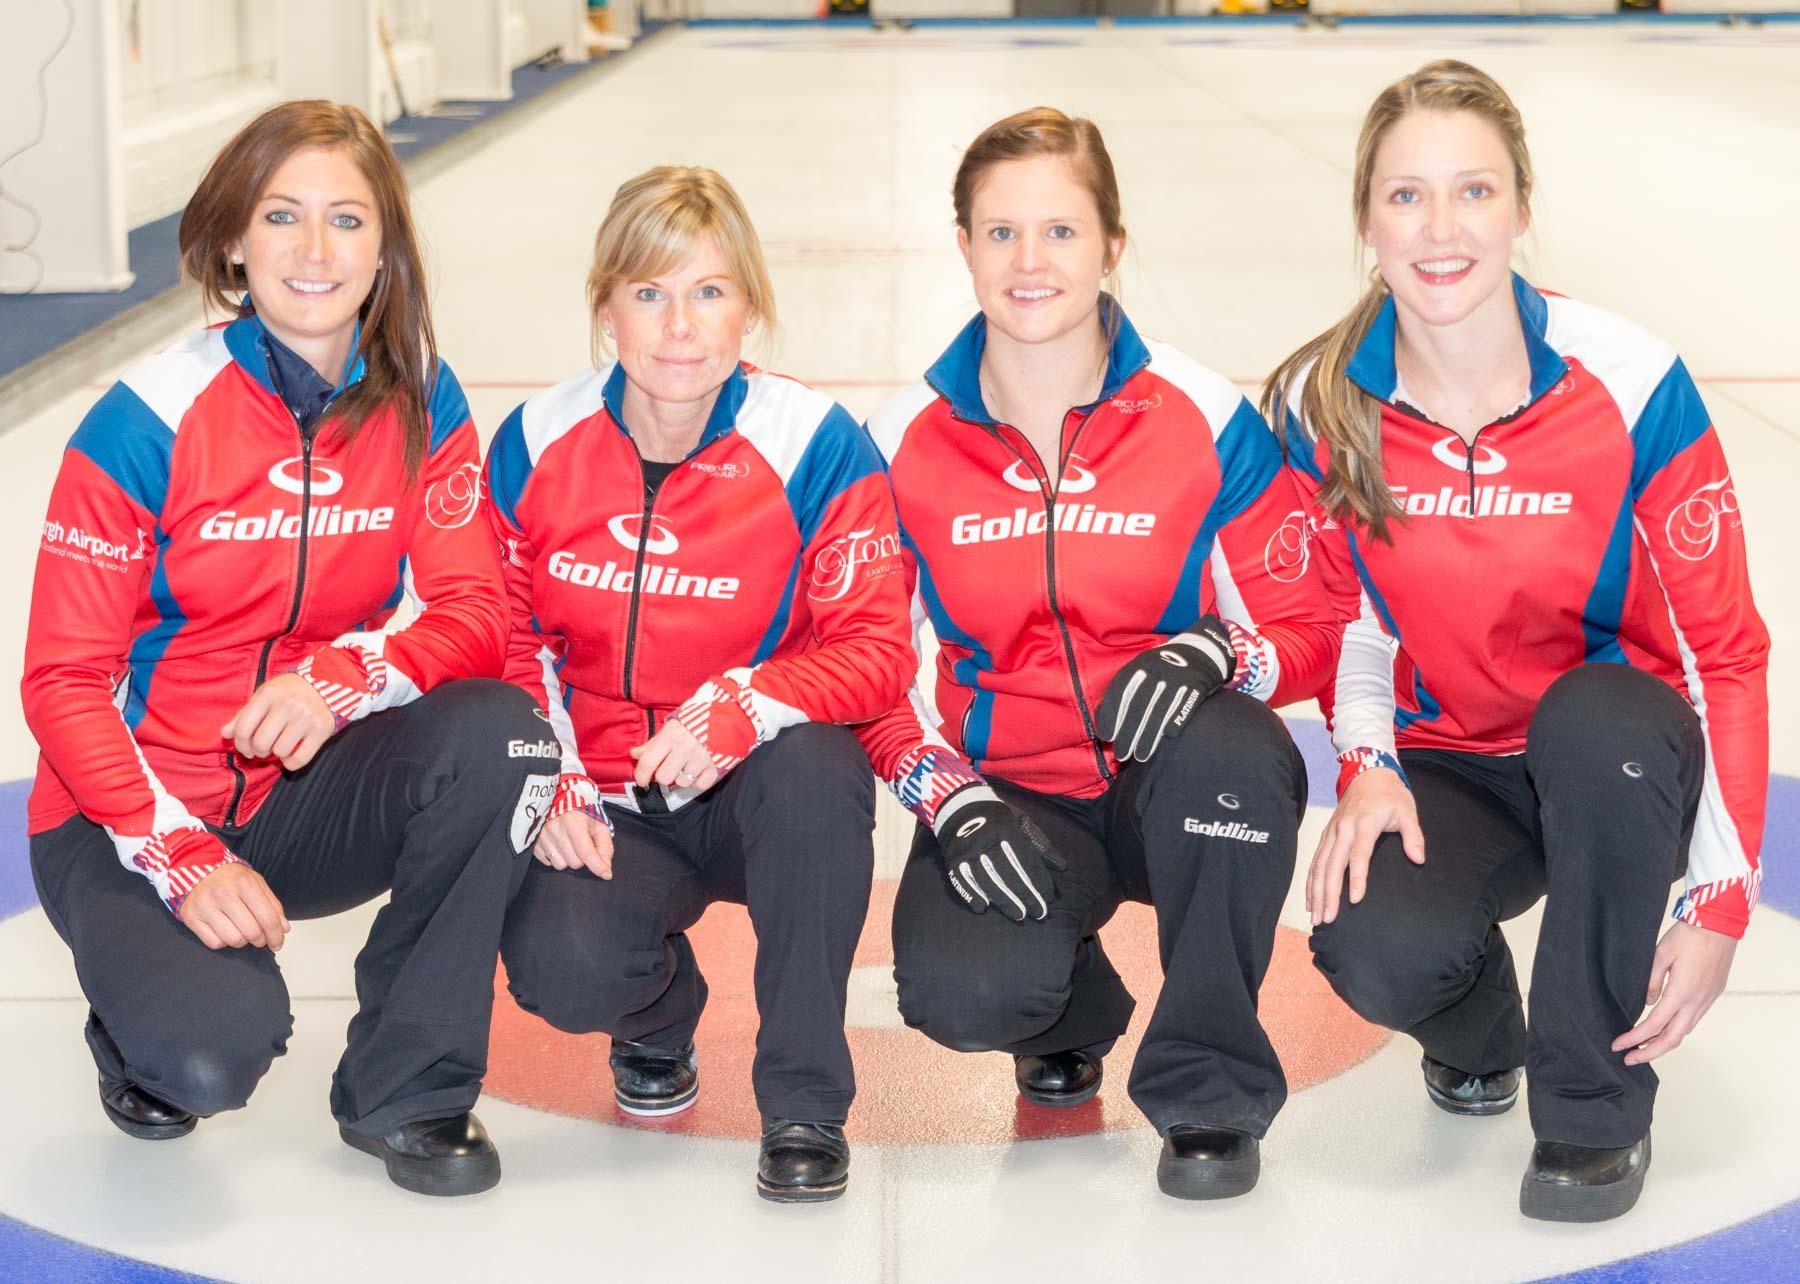 Team Muirhead for this weekend's Euro qualifiers  - Eve Muirhead, Kelly Schafer, Vicki Adams and Lauren Gray.